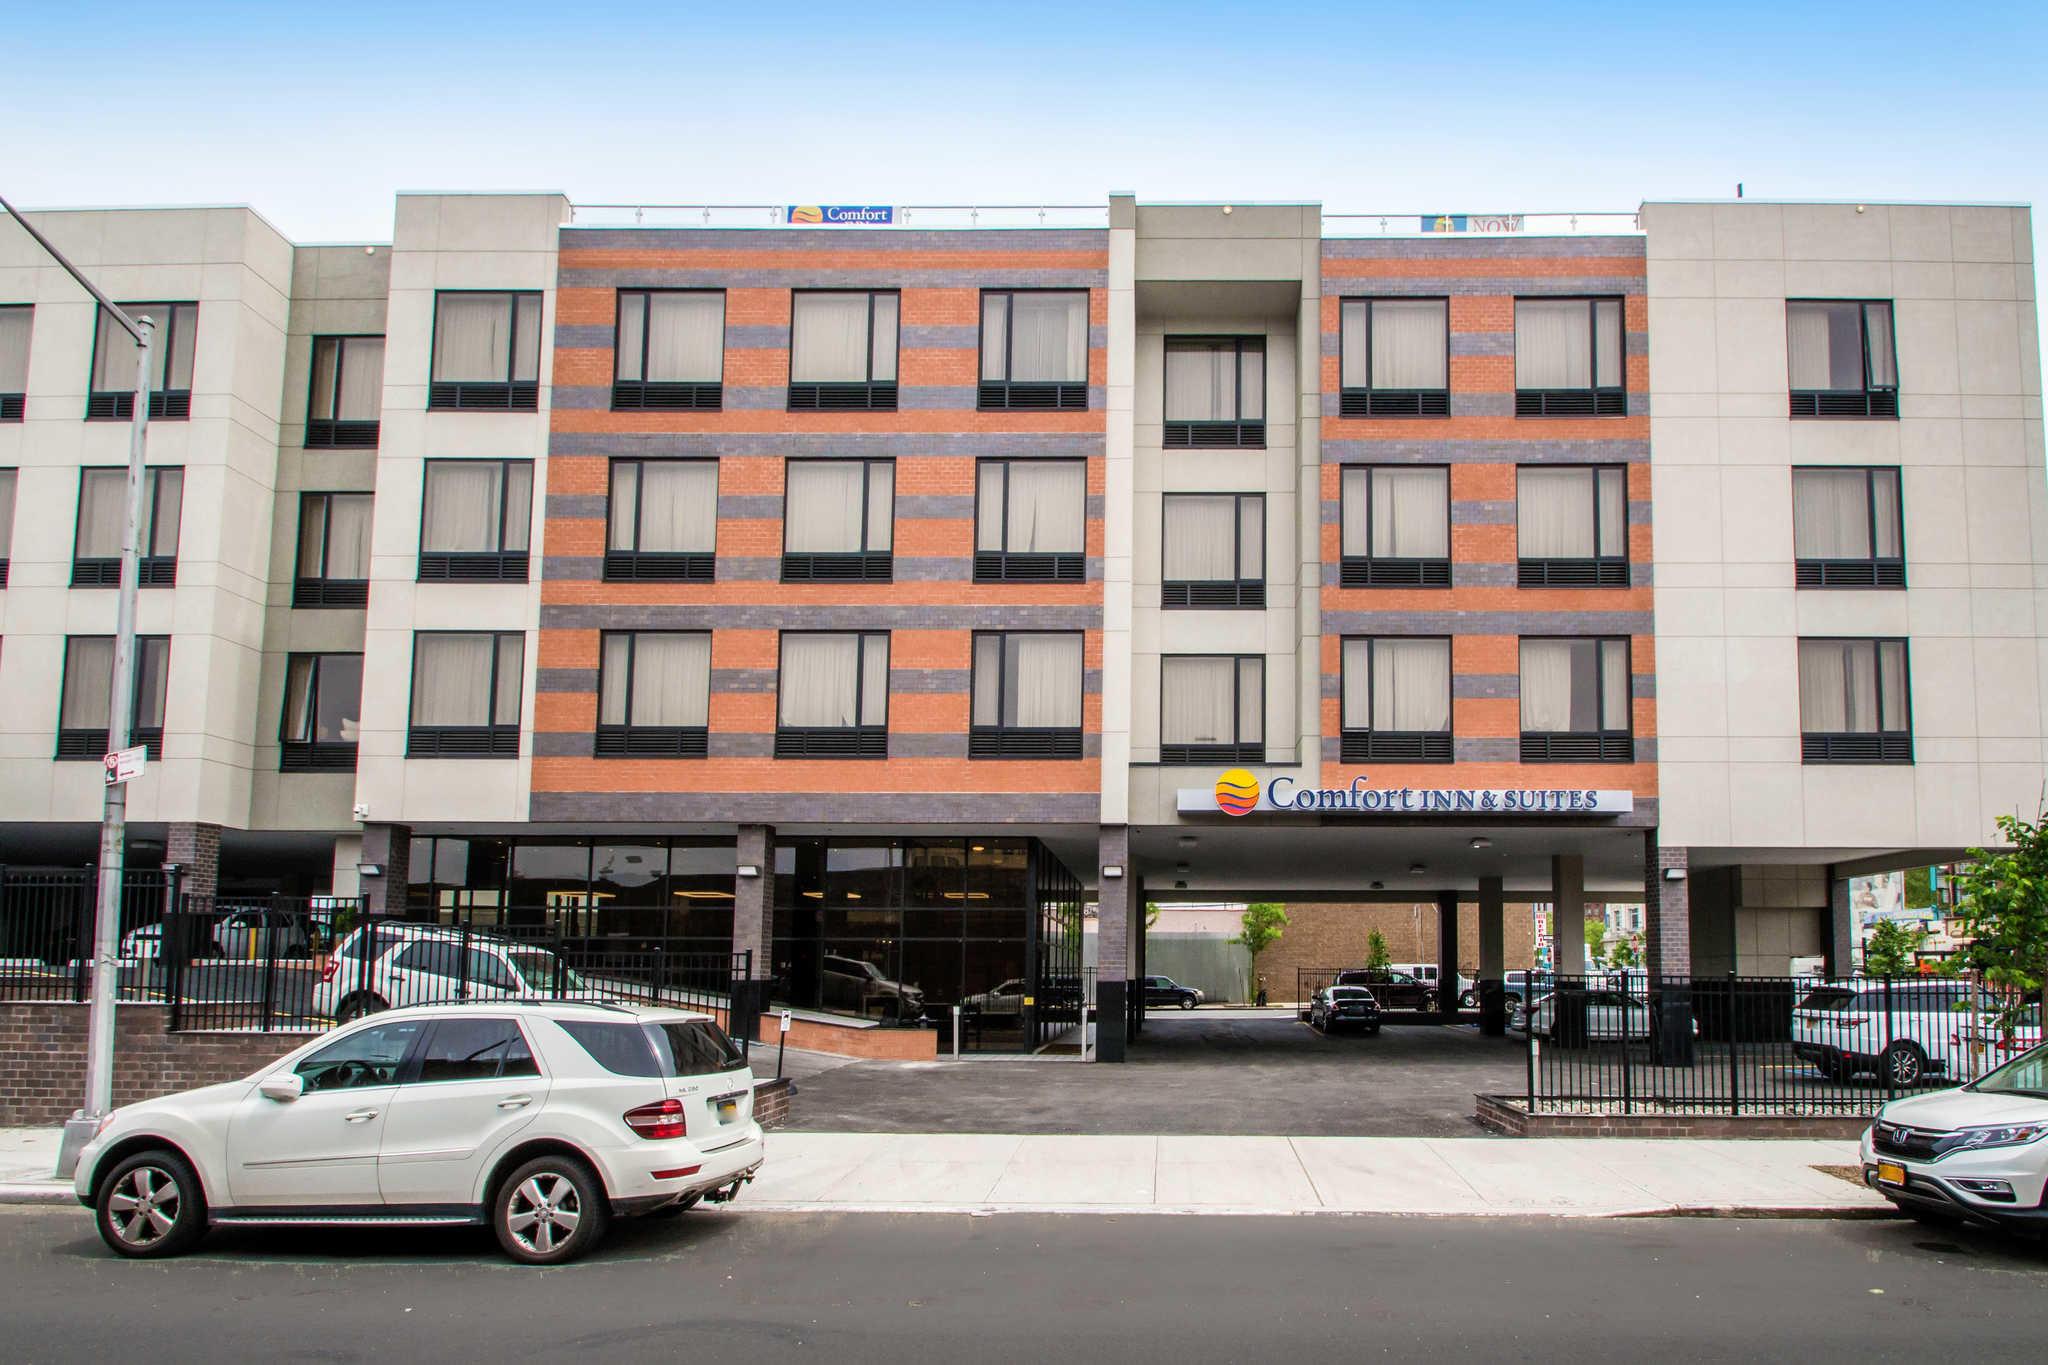 Comfort Inn & Suites near Stadium image 2